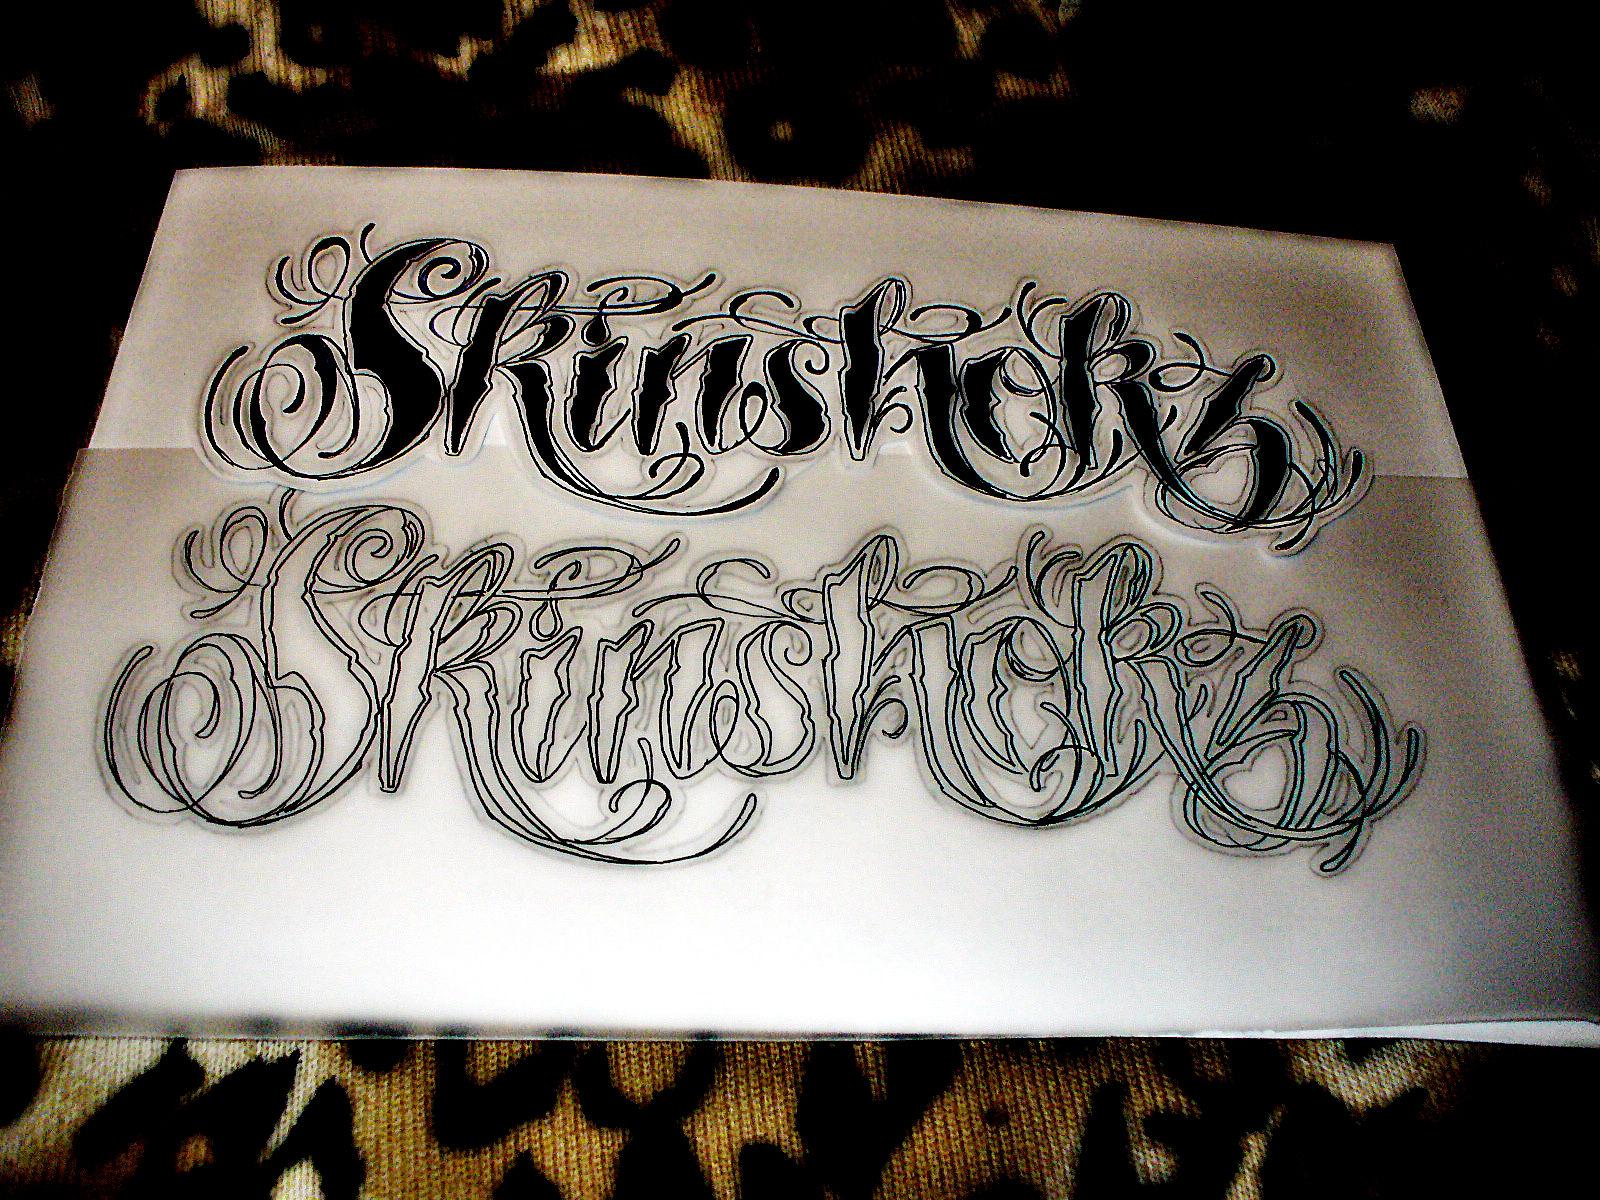 Lizvengeance art skinshokz tattoo script Script art